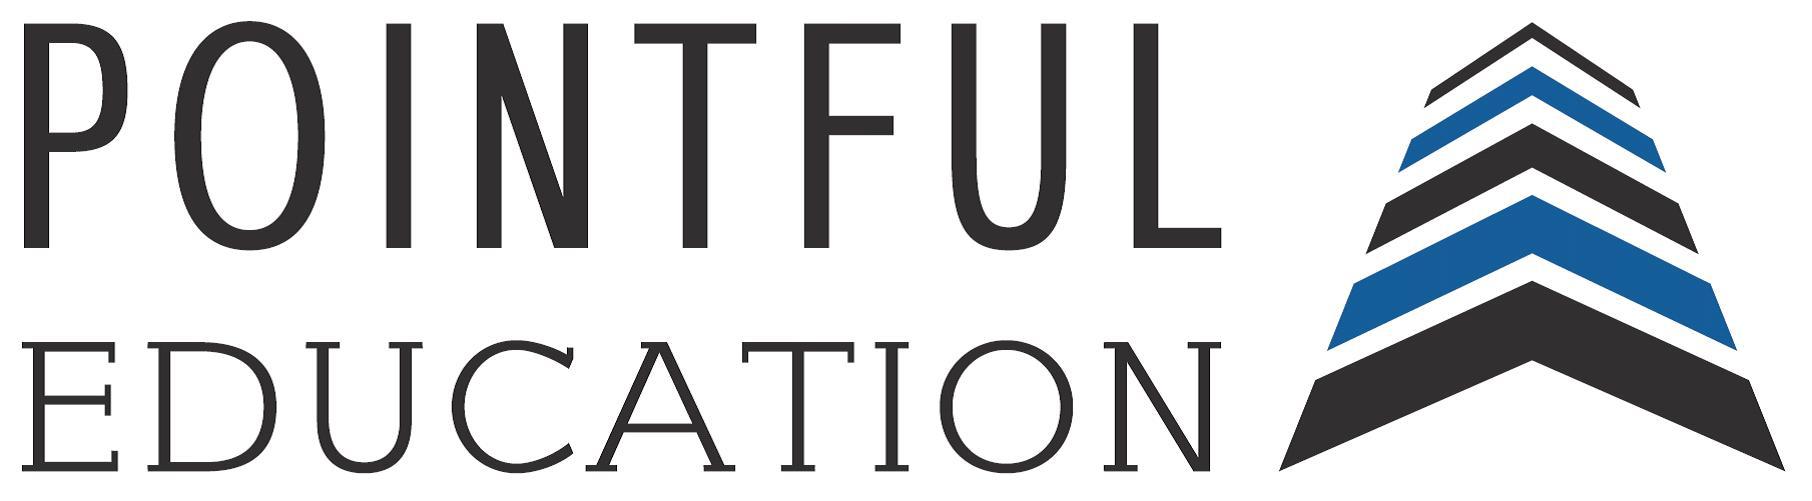 Pointful Education logo